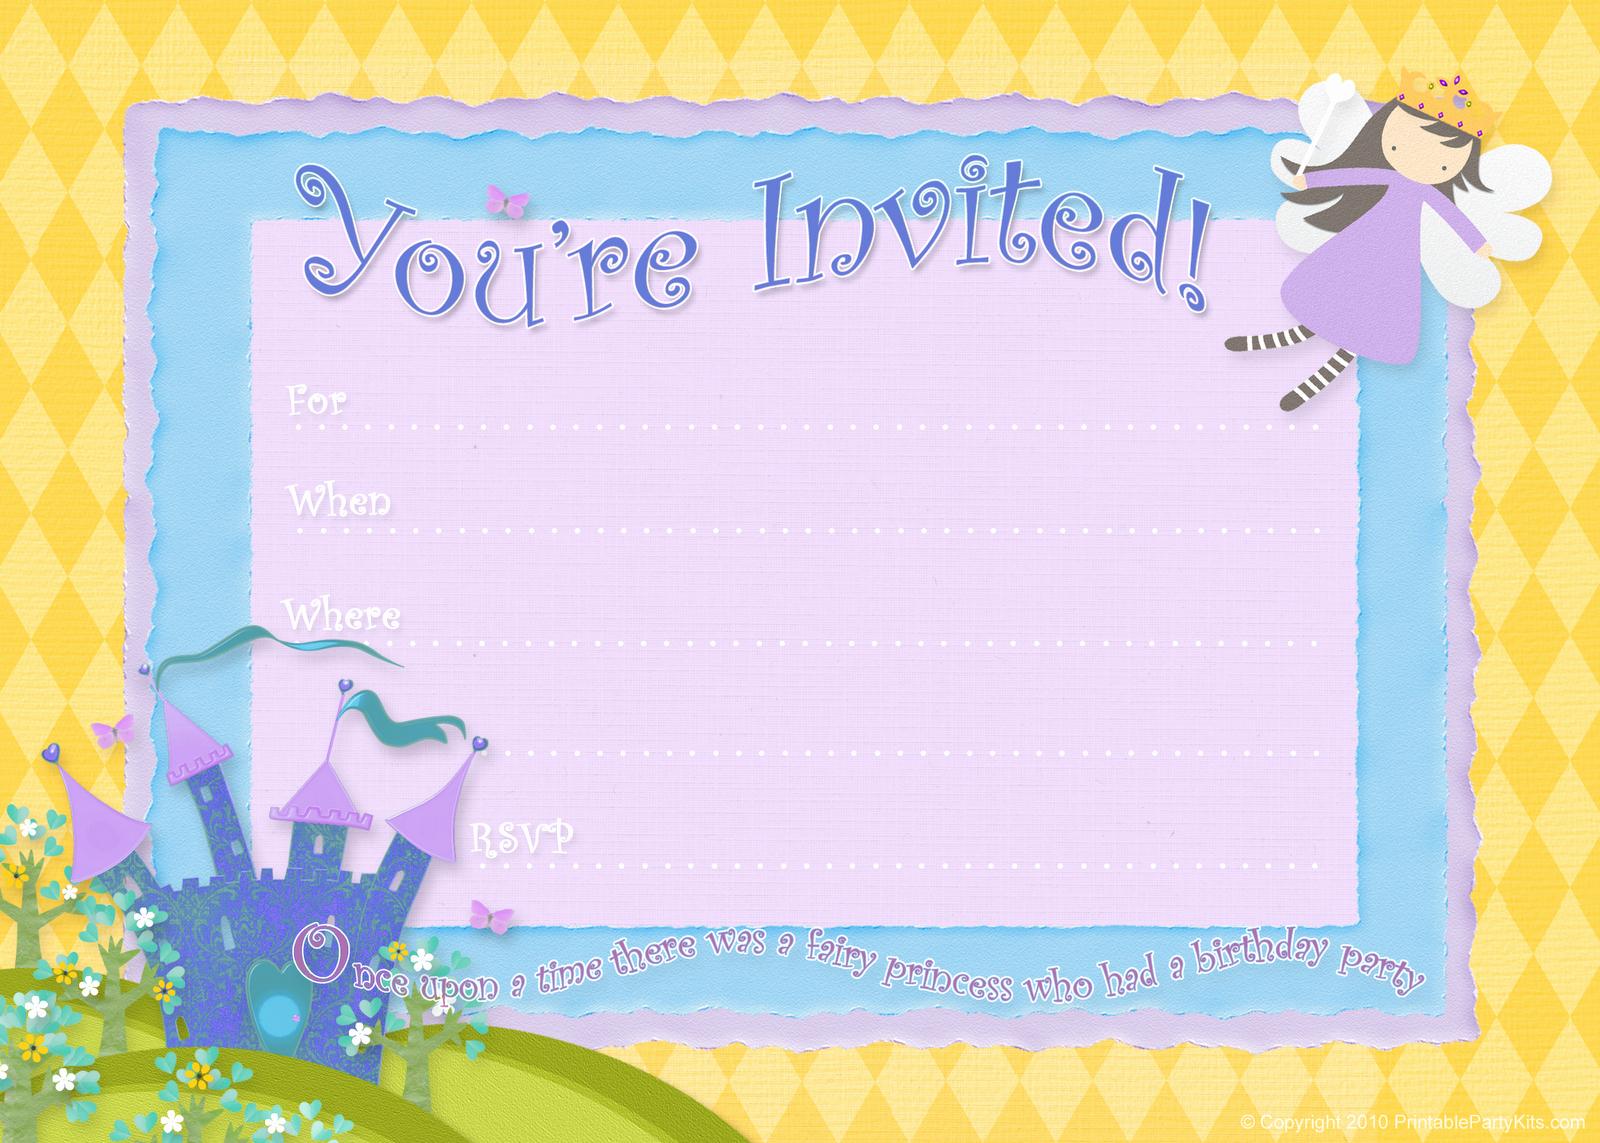 Free Invitation Templates Printable Fresh Free Birthday Party Invitations – Bagvania Free Printable